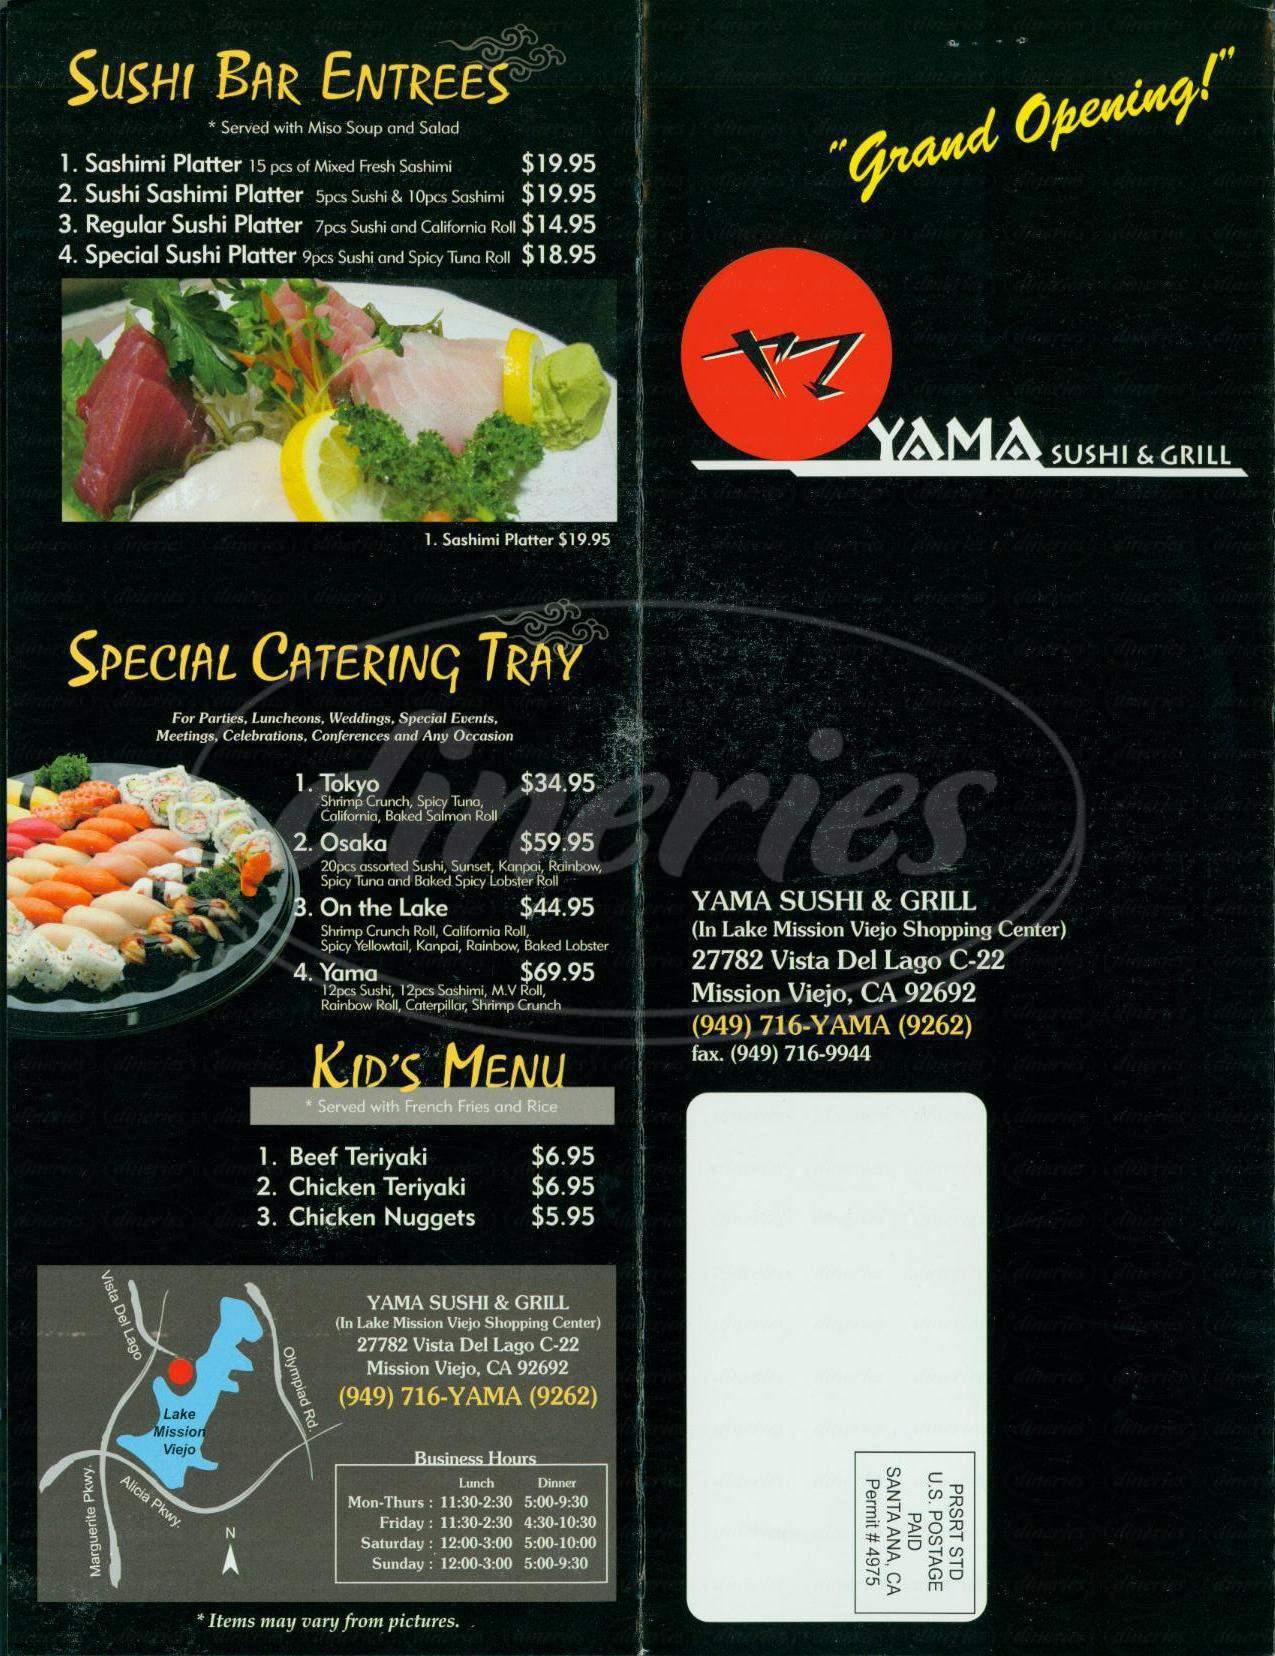 menu for Yama Sushi & Grill